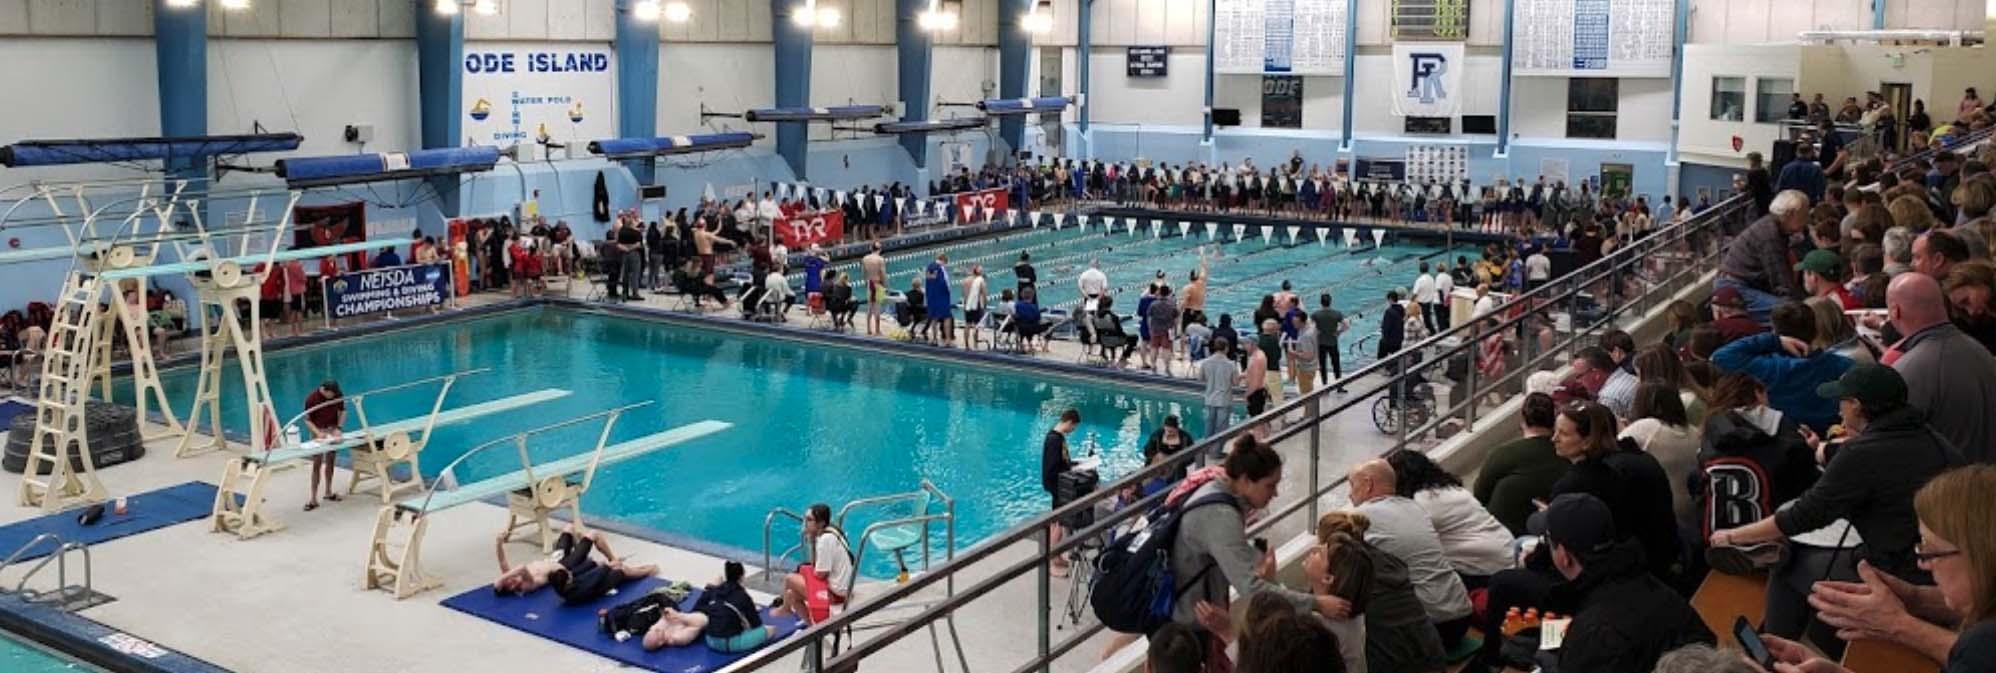 University of Rhode Island Aquatics pool